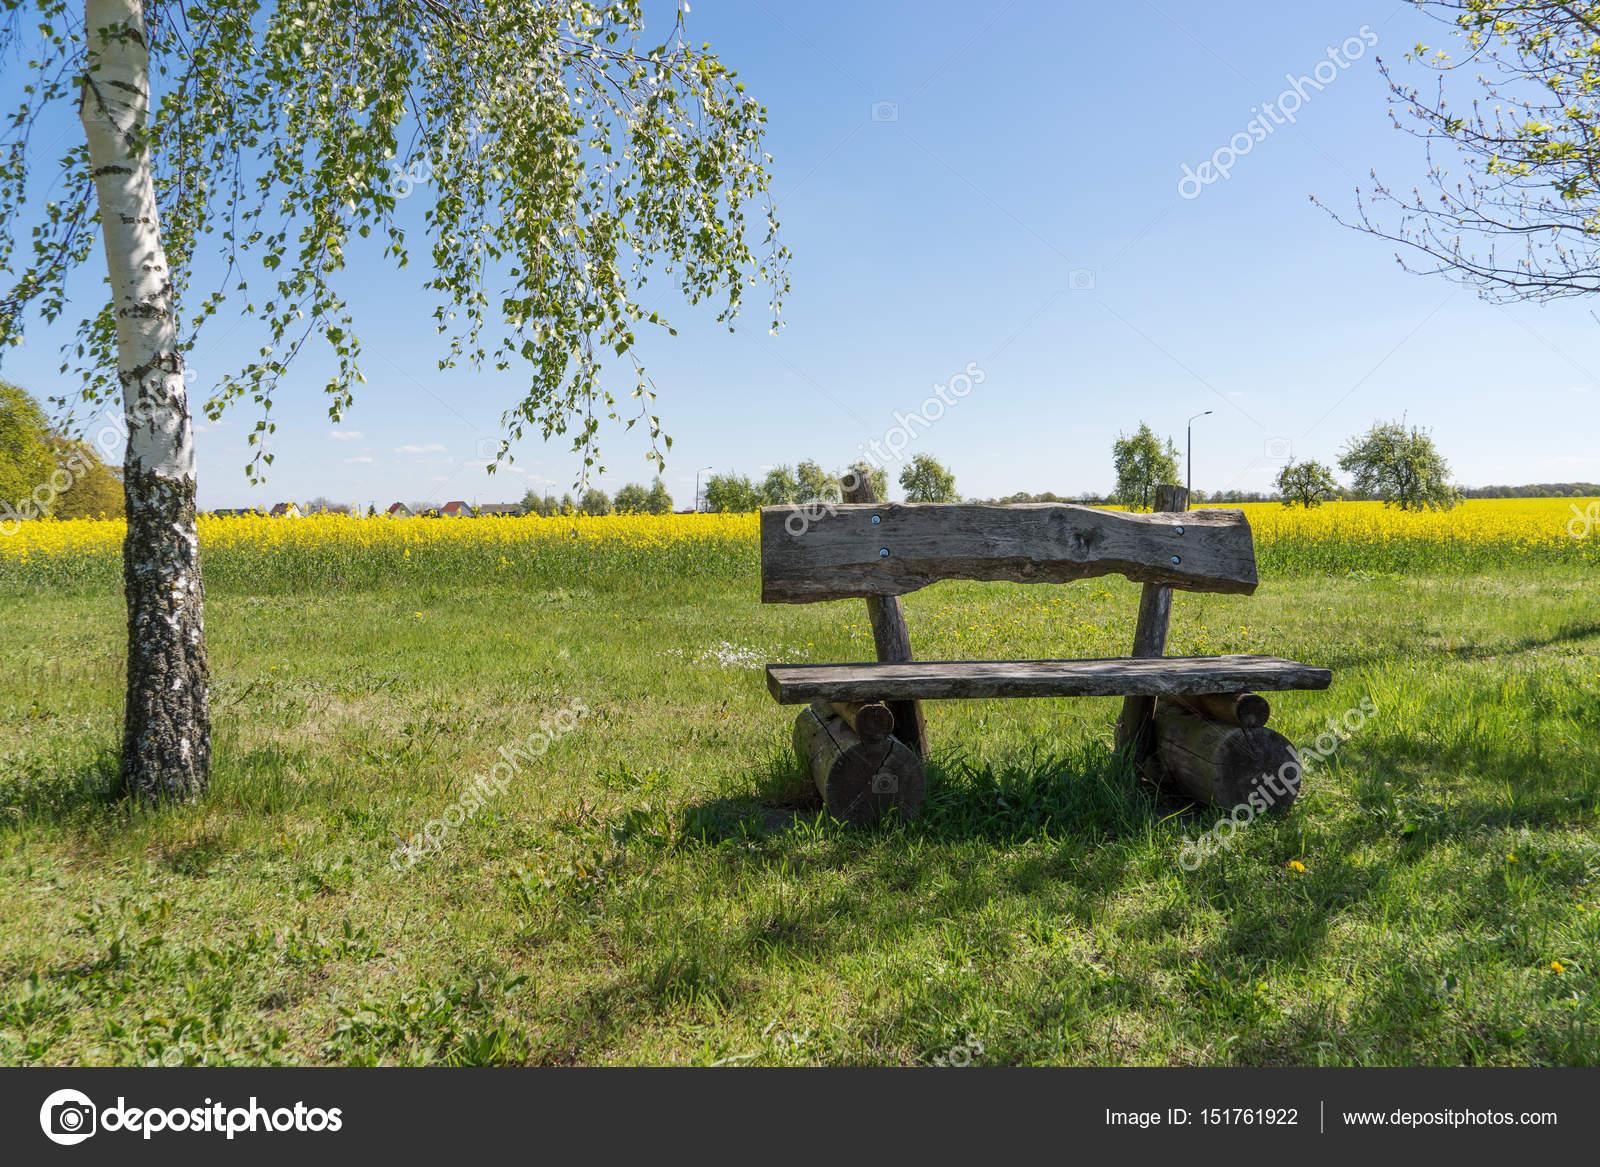 Tremendous Wooden Bench Outdoors Rape Field In The Background Stock Uwap Interior Chair Design Uwaporg